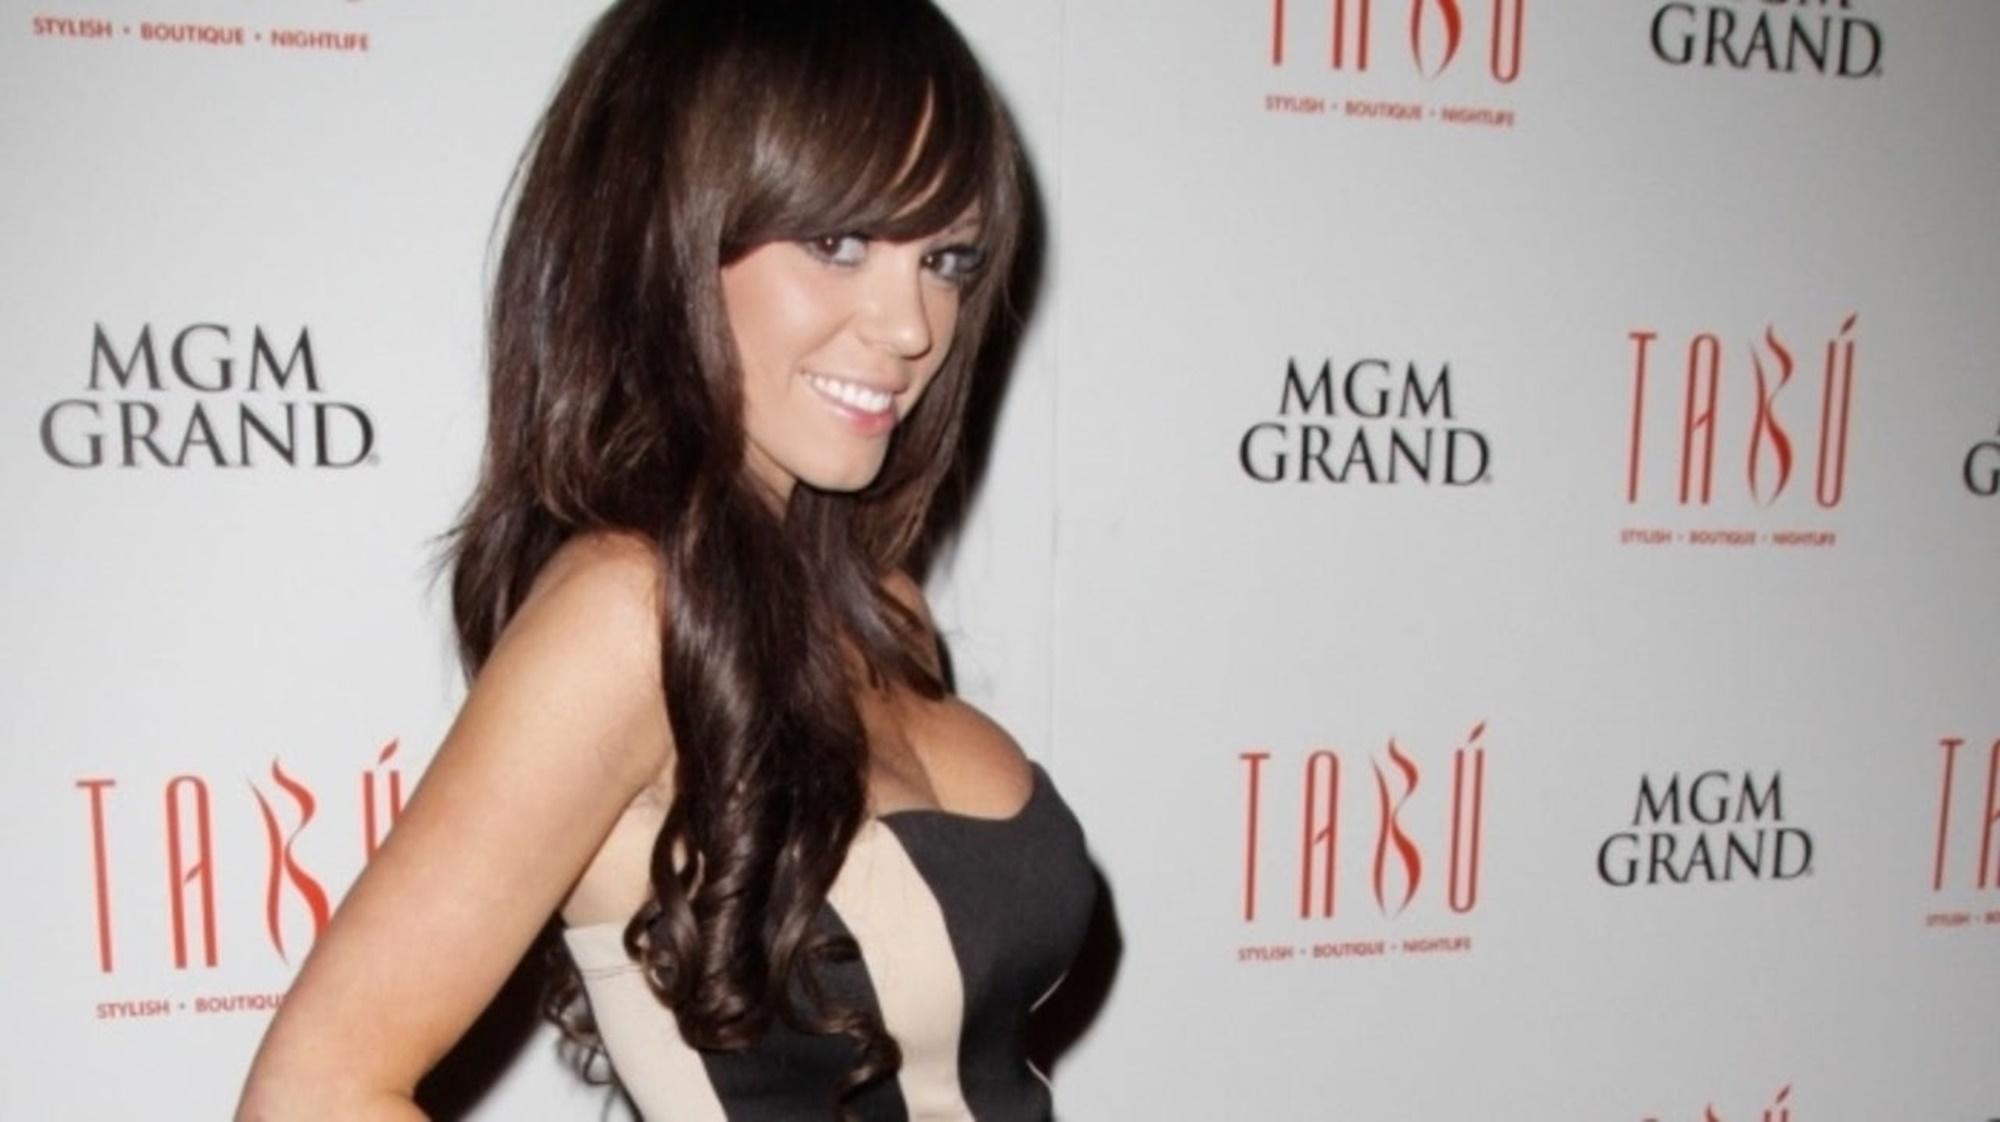 Valerie Mason Playboy Playmate Arrested